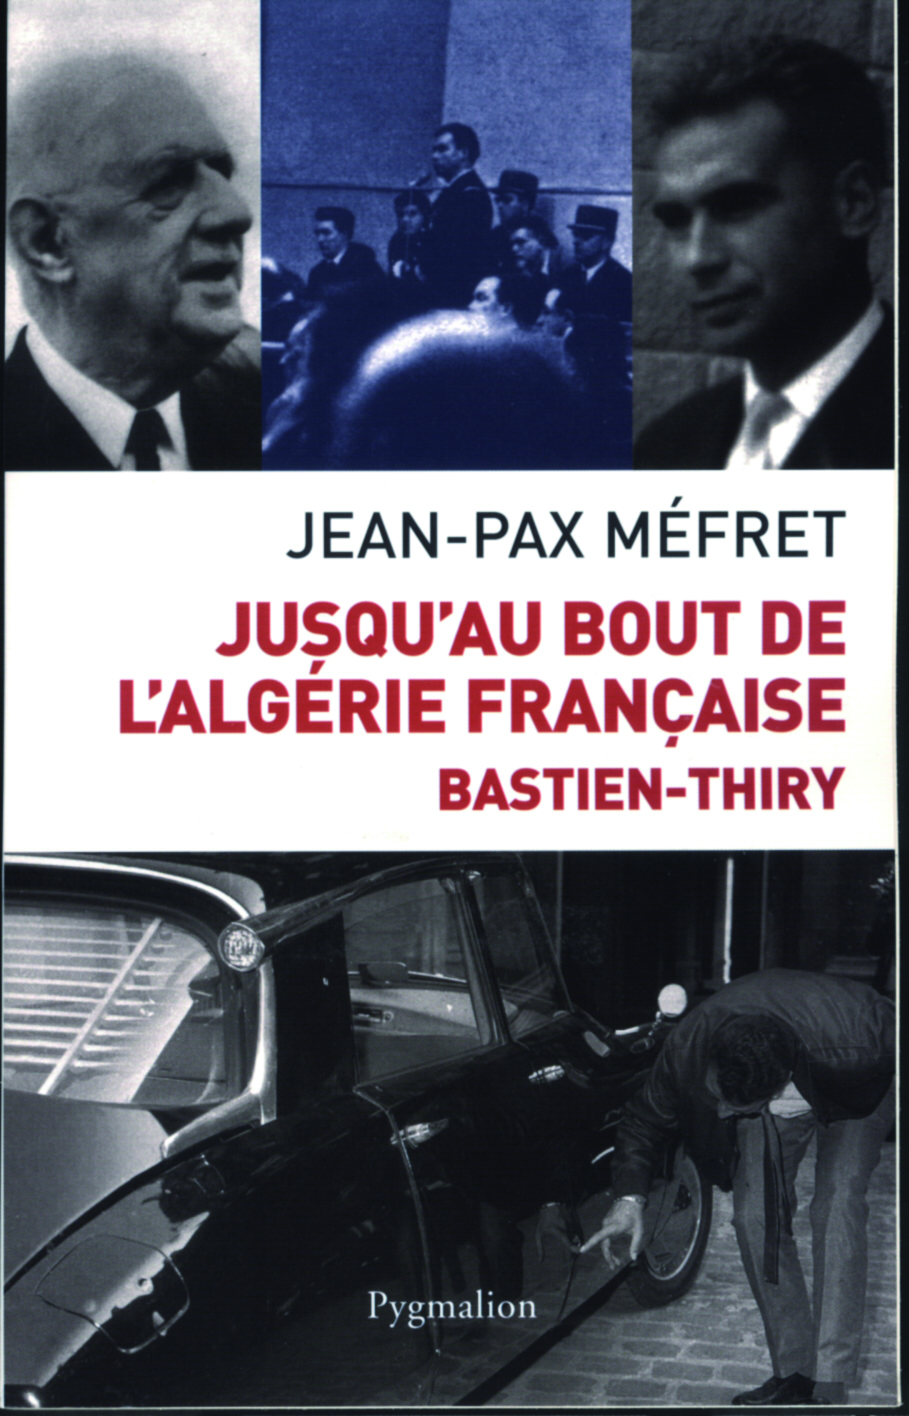 [Algérie+française]